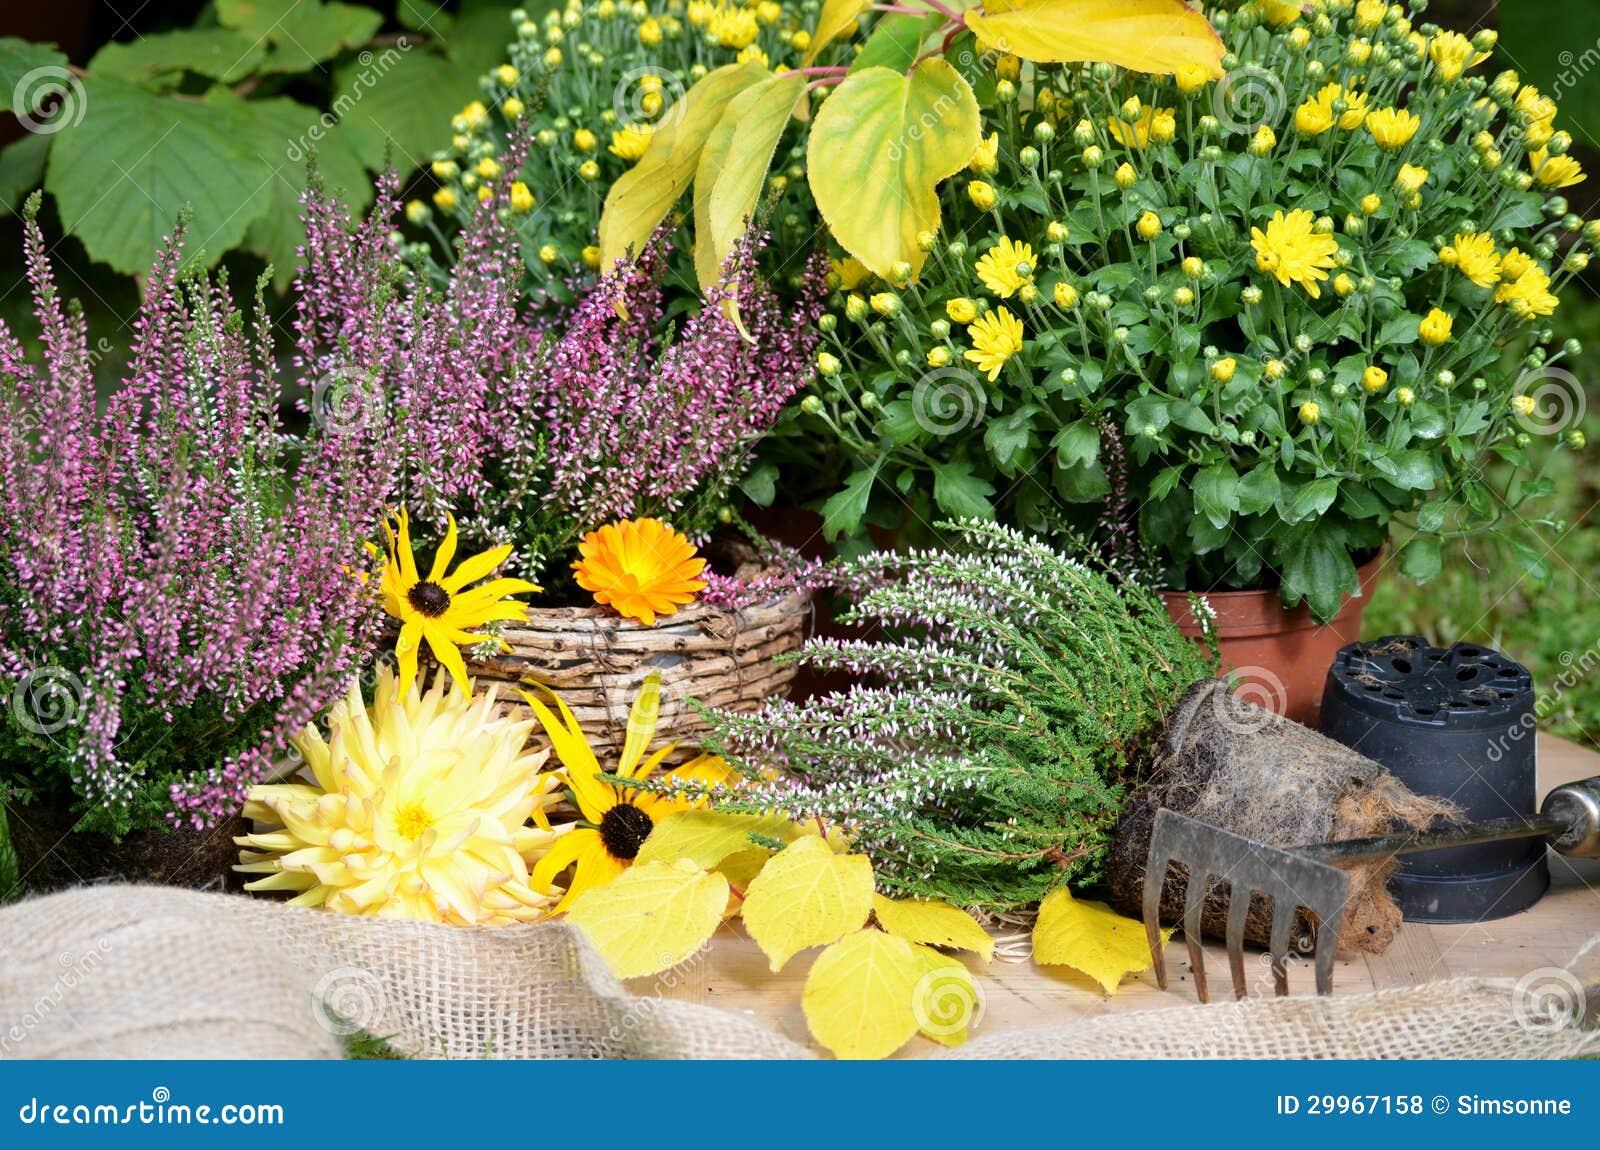 Autumn Flowers In The Garden Royalty Free Stock Photos